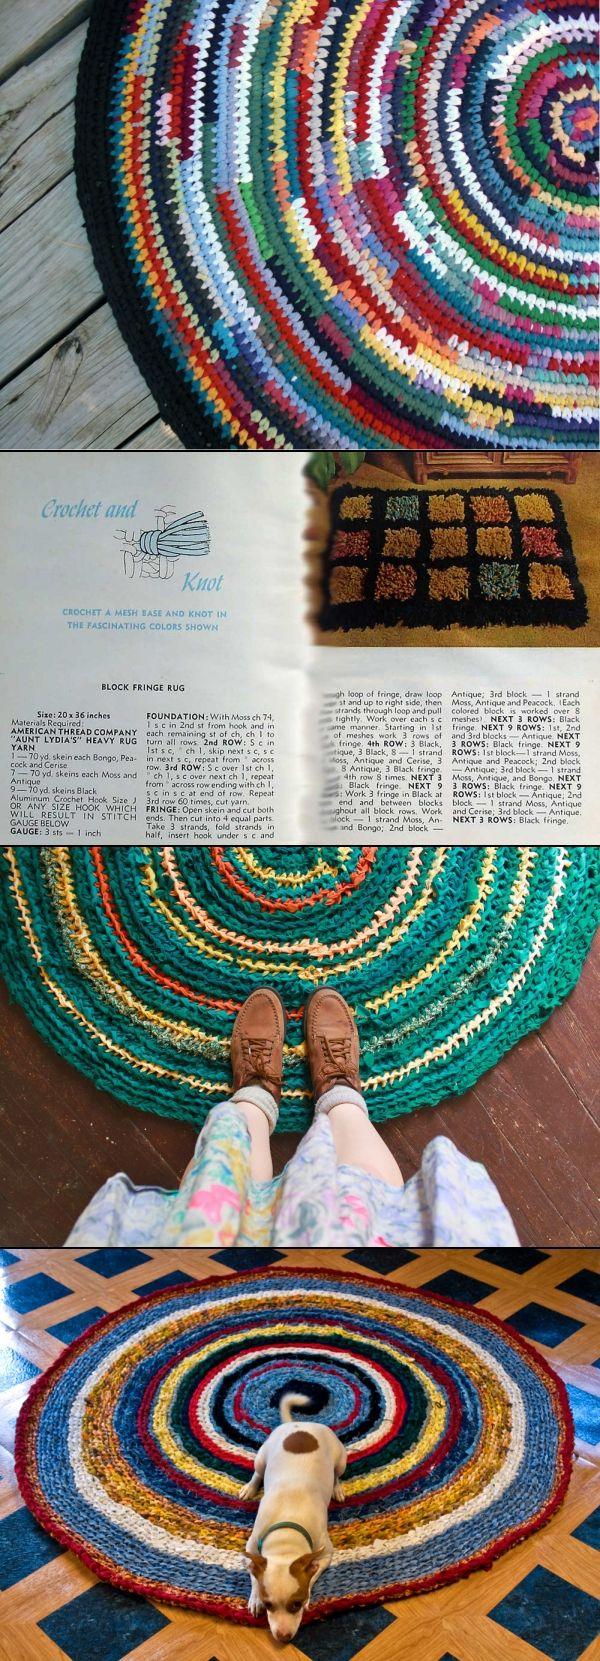 Crochet Rag Rugs - Ideas & Inspiration.